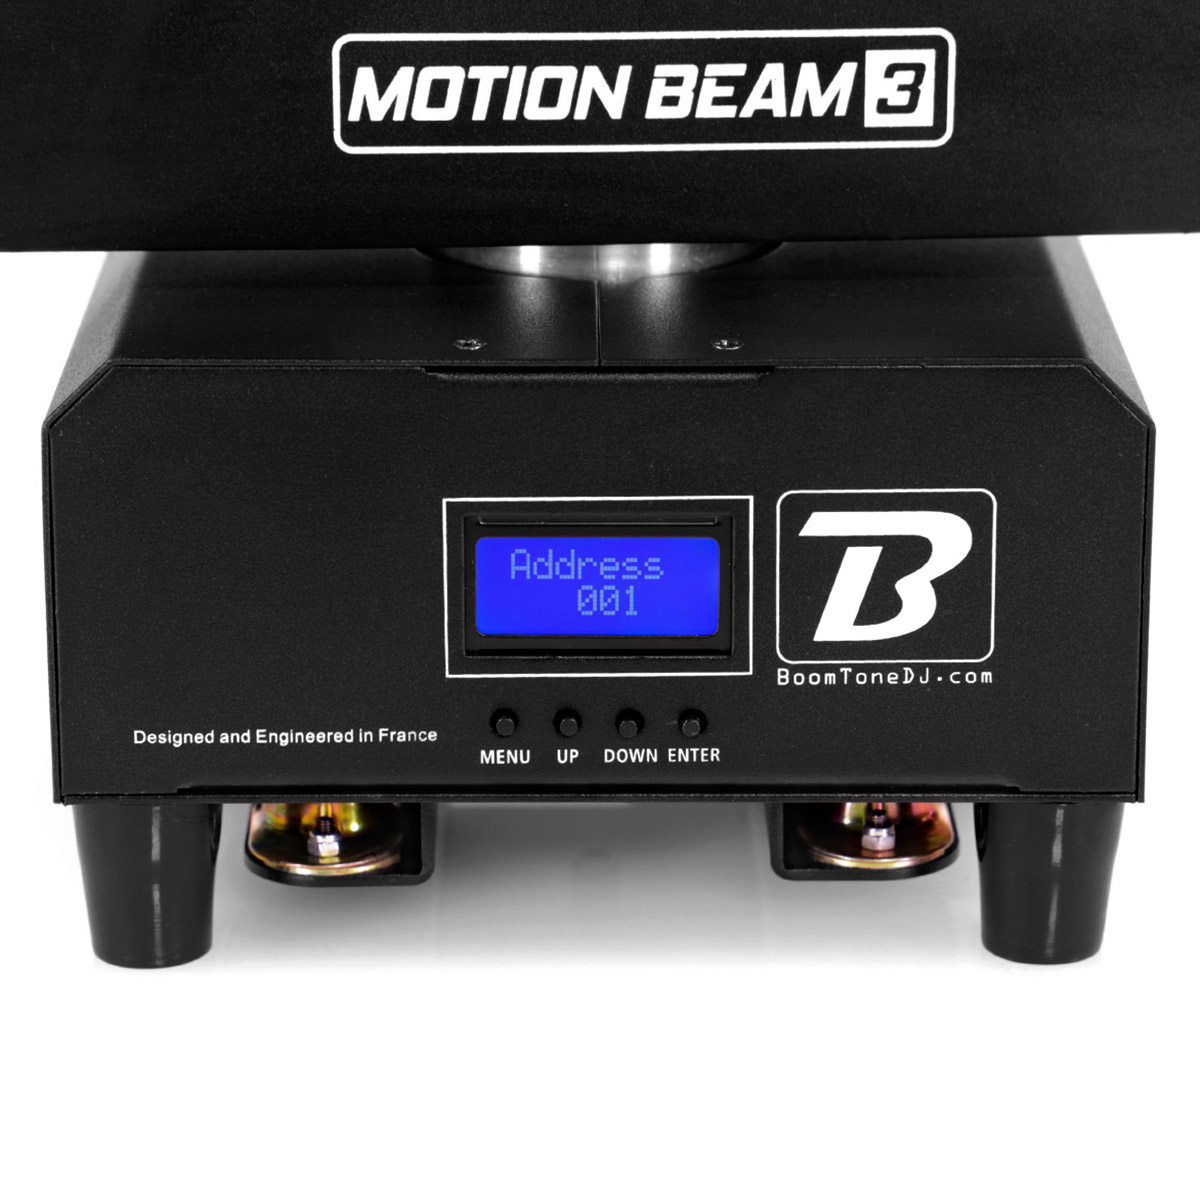 Motion Beam 3